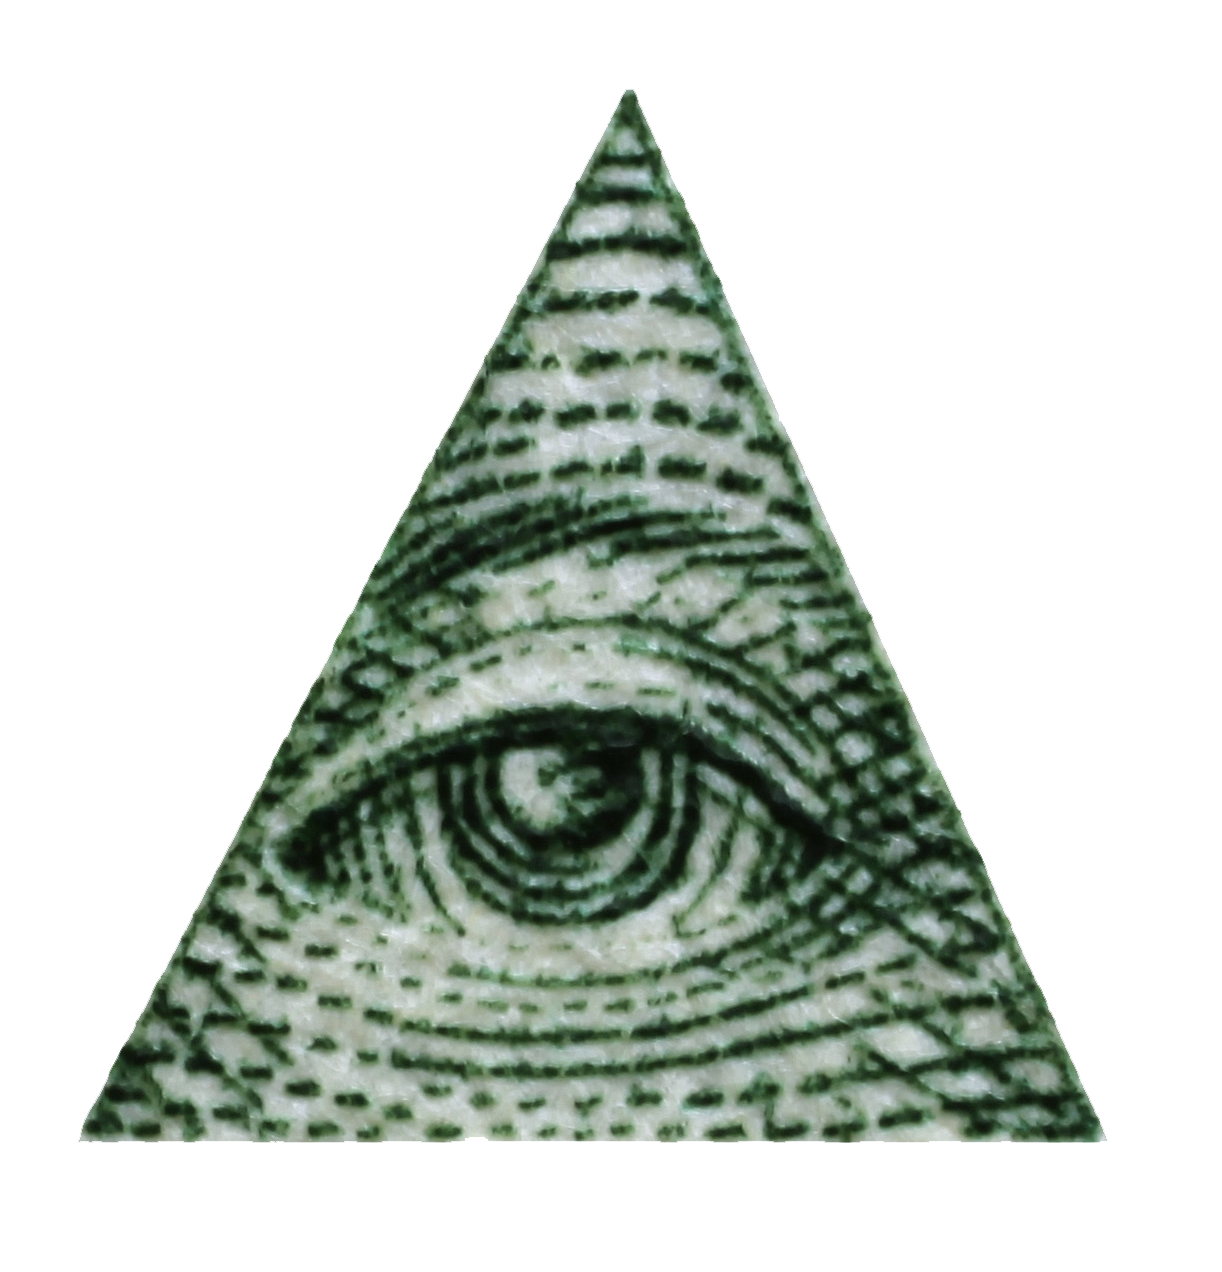 Illuminati Eye of Providence Secret society Clip art.